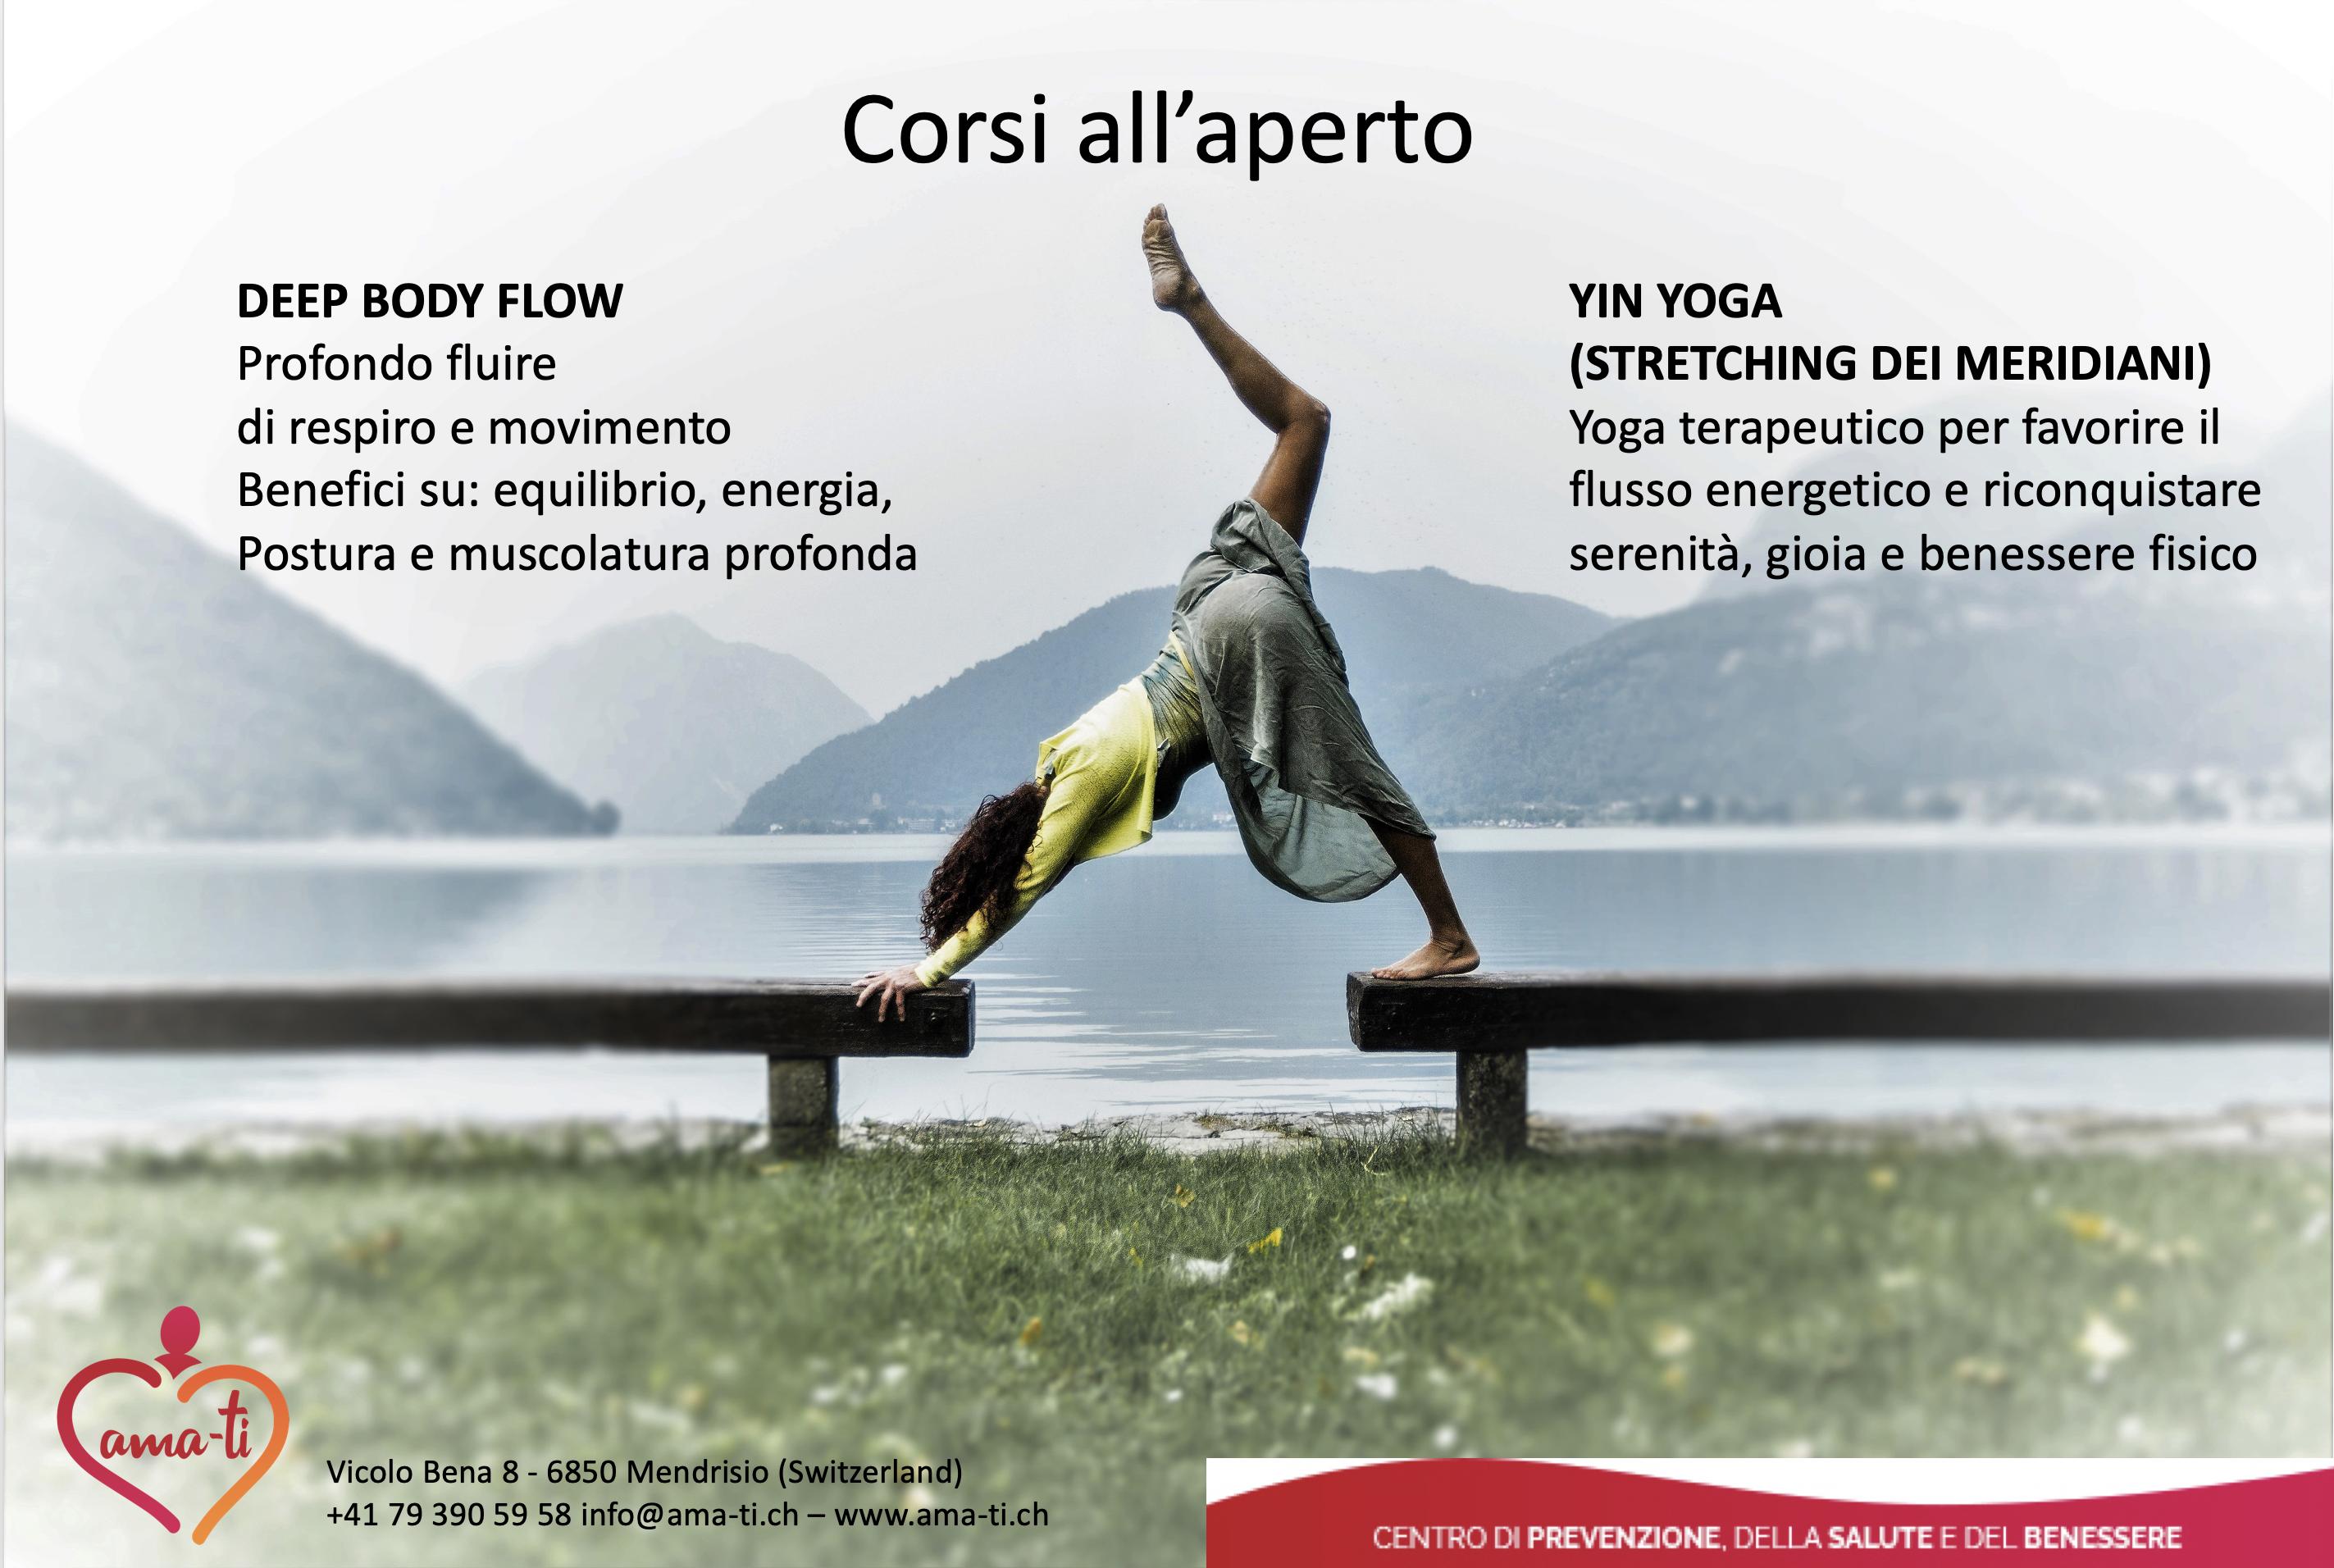 Deep Body Flow And New Yin Yoga Classes Ama Ti